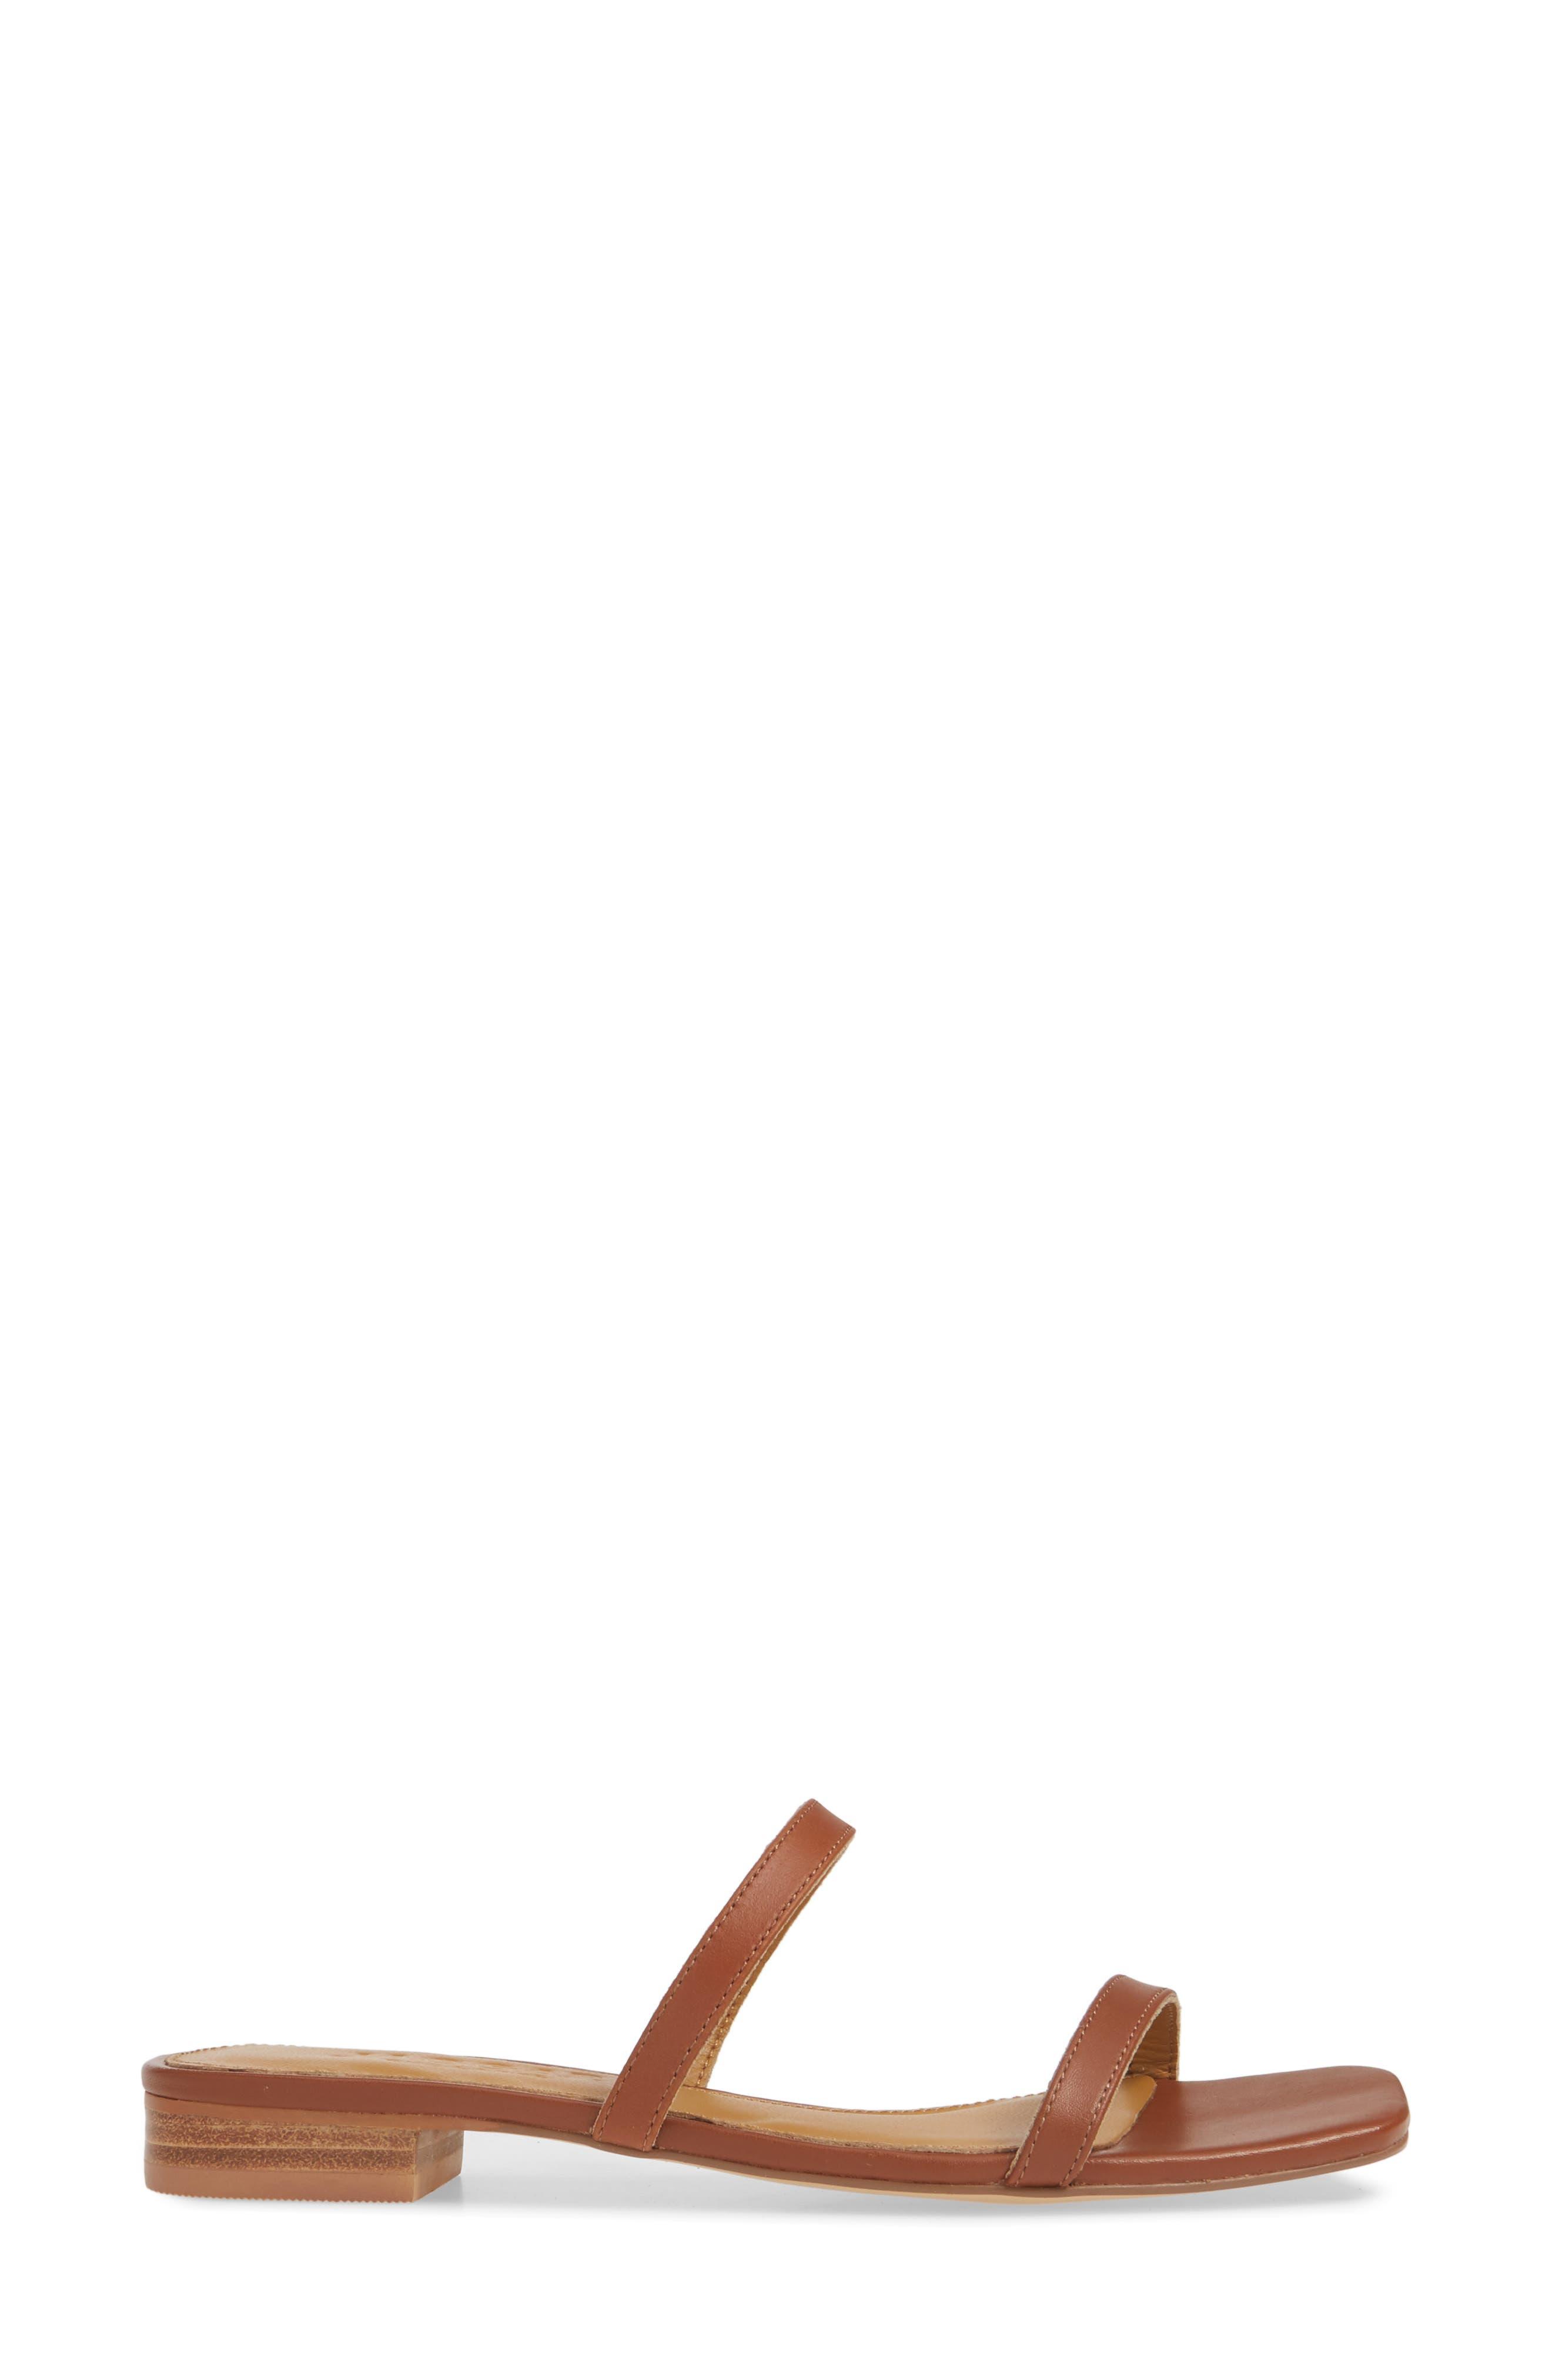 JAGGAR, Sprung Slide Sandal, Alternate thumbnail 3, color, RUST LEATHER